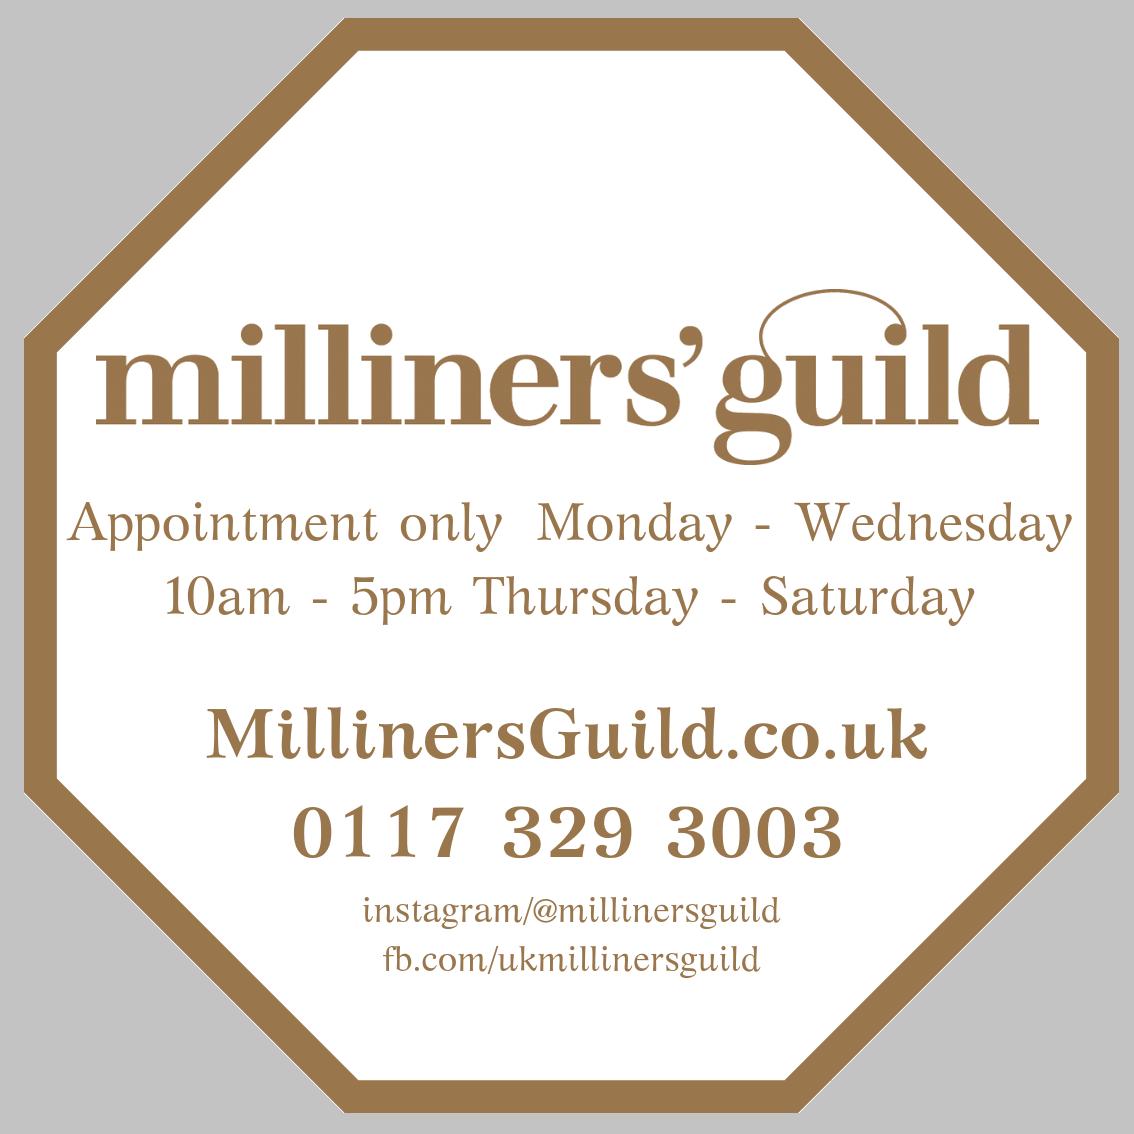 Milliners' Guild